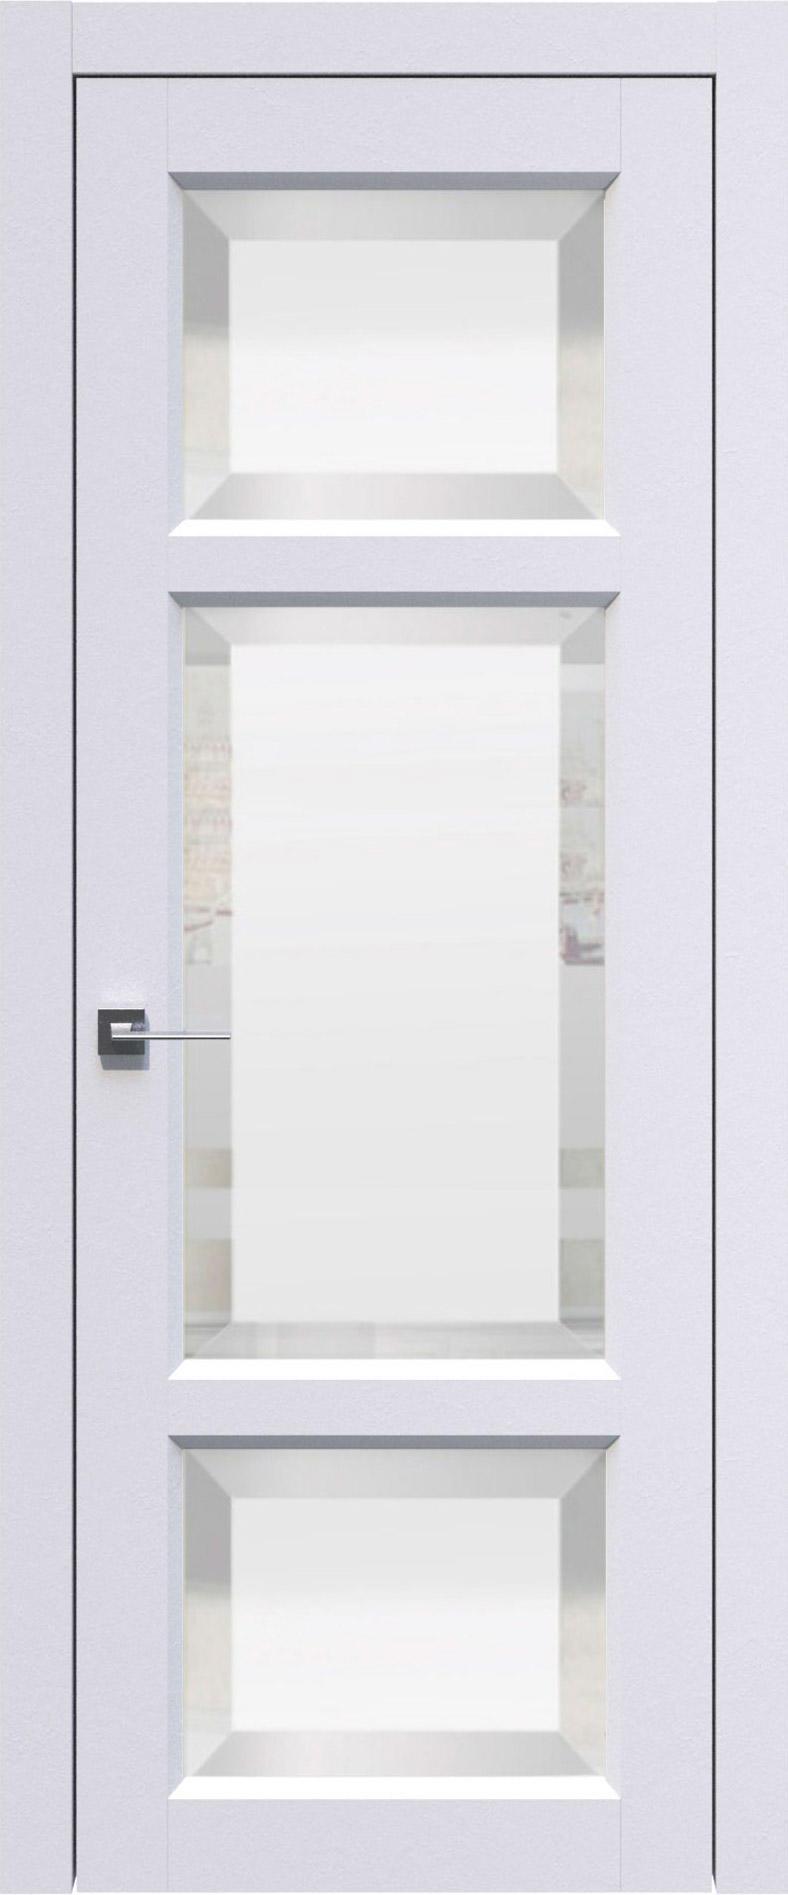 Siena цвет - Арктик белый Со стеклом (ДО)